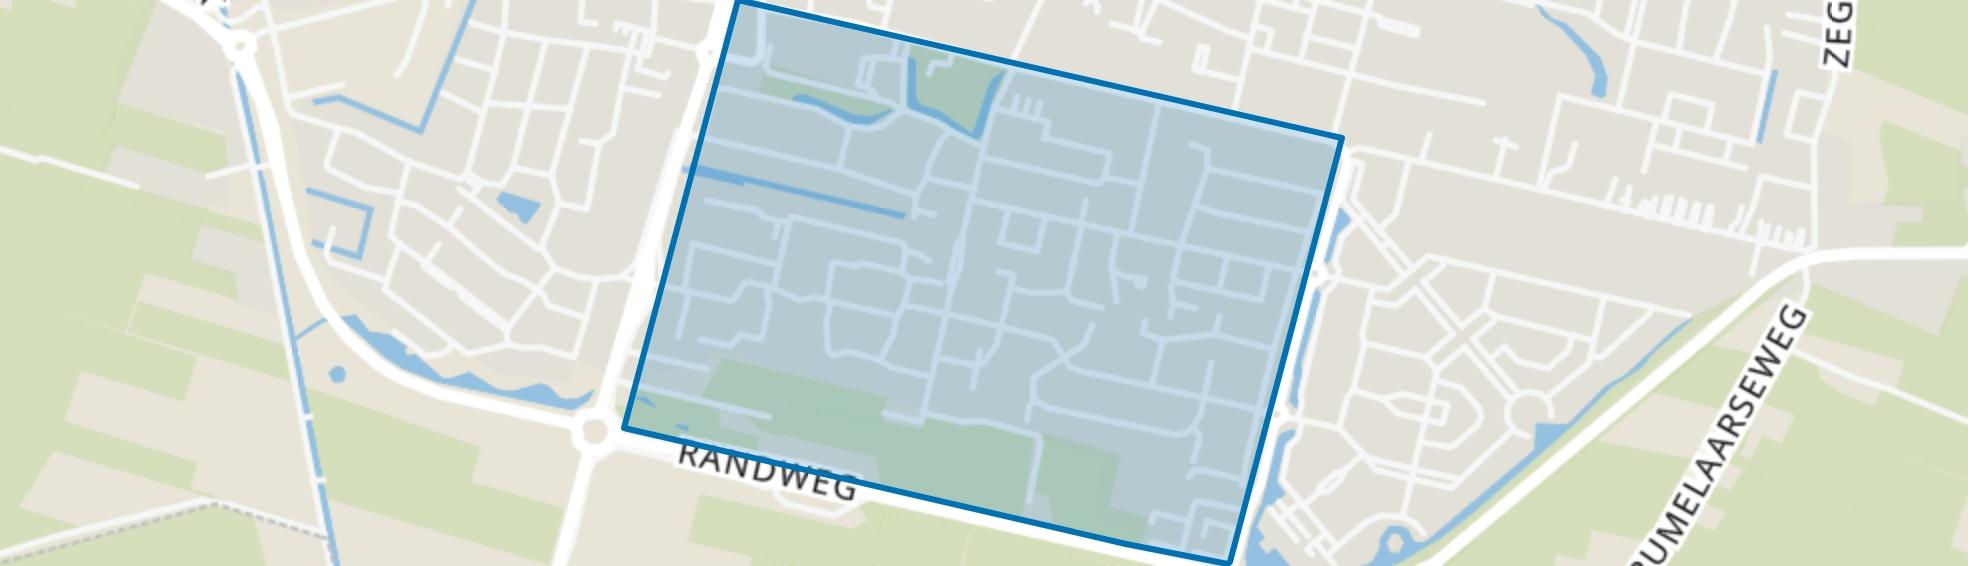 Laanzicht, Woudenberg map